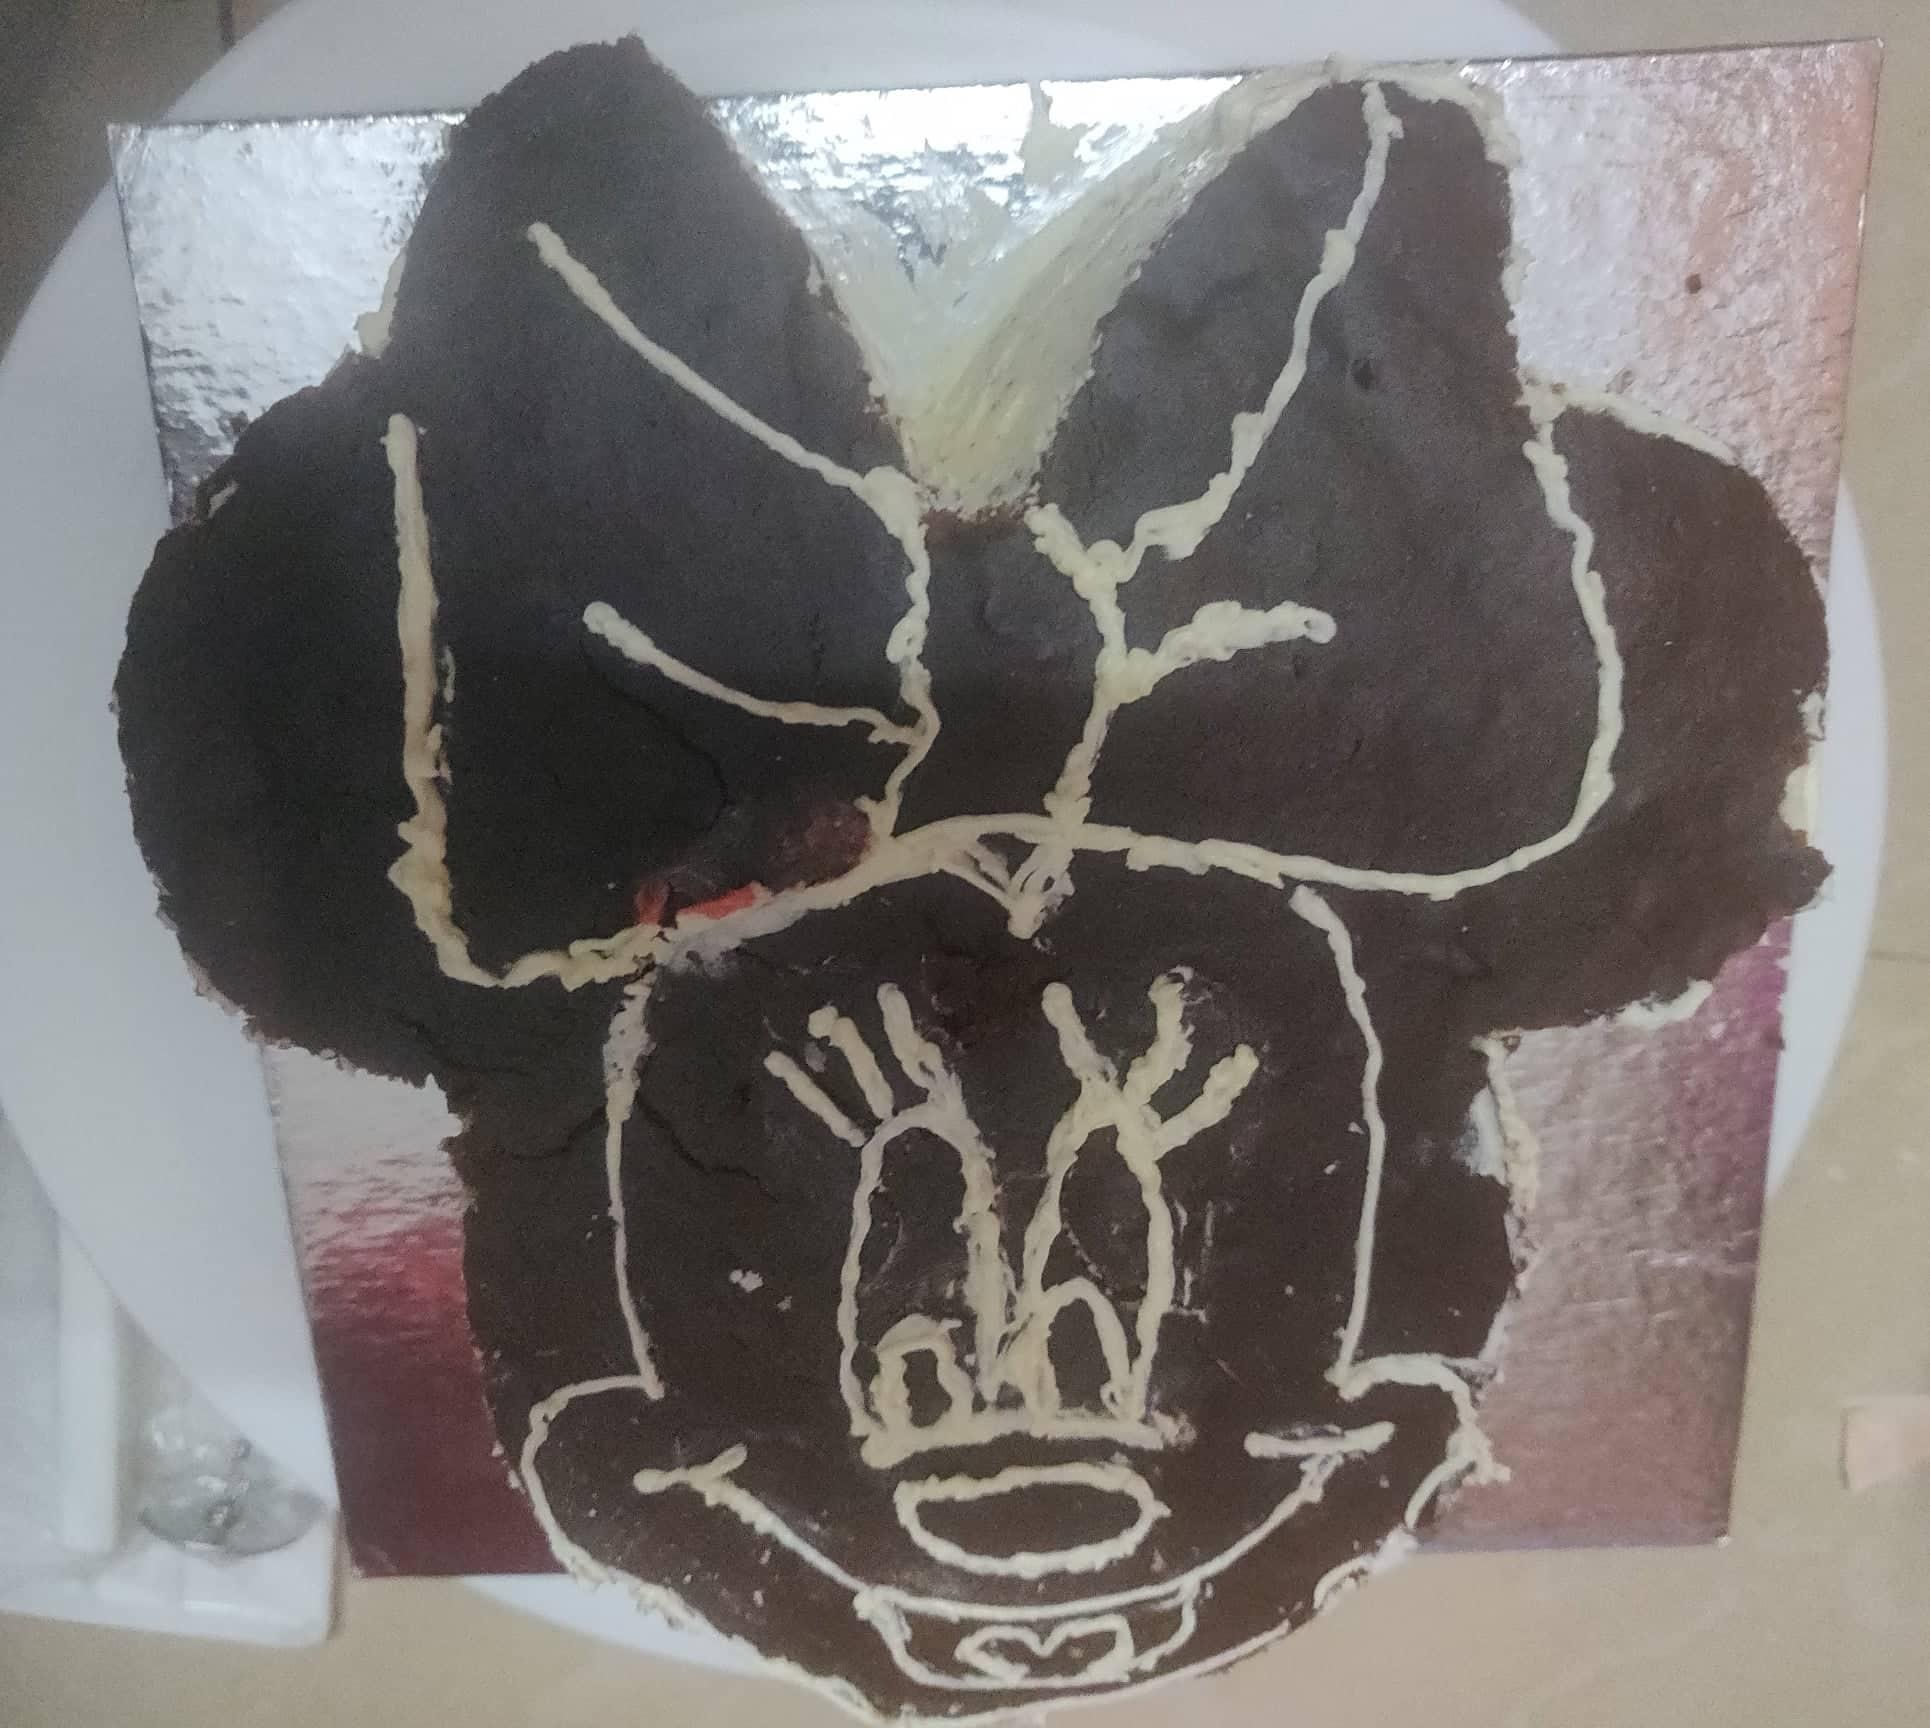 Minnie_Mouse_Cake - 178103613_562363211393704_2719464120065138058_n-1